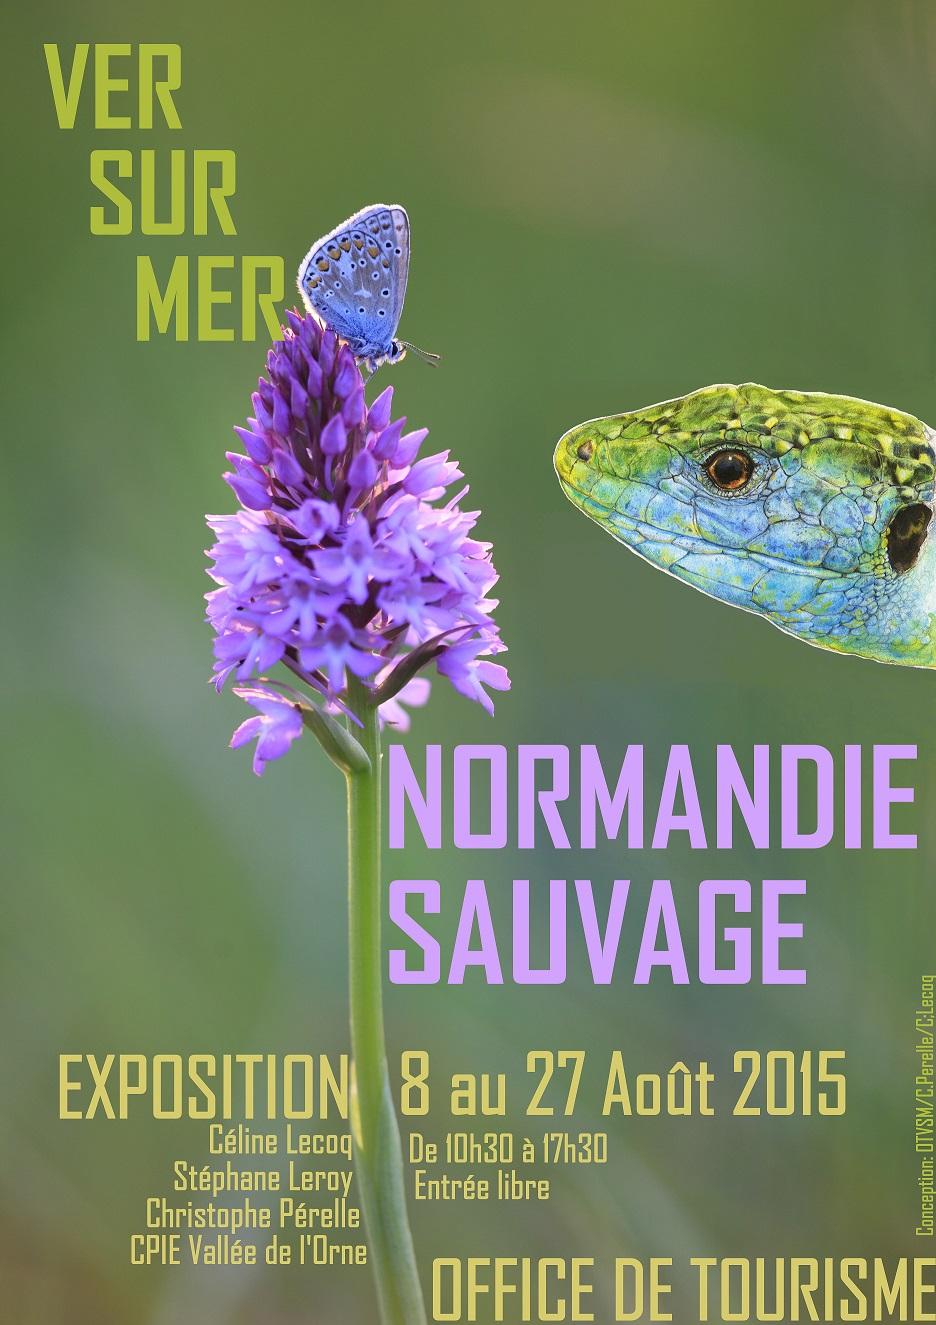 14 - Ver-sur-Mer • Exposition photo